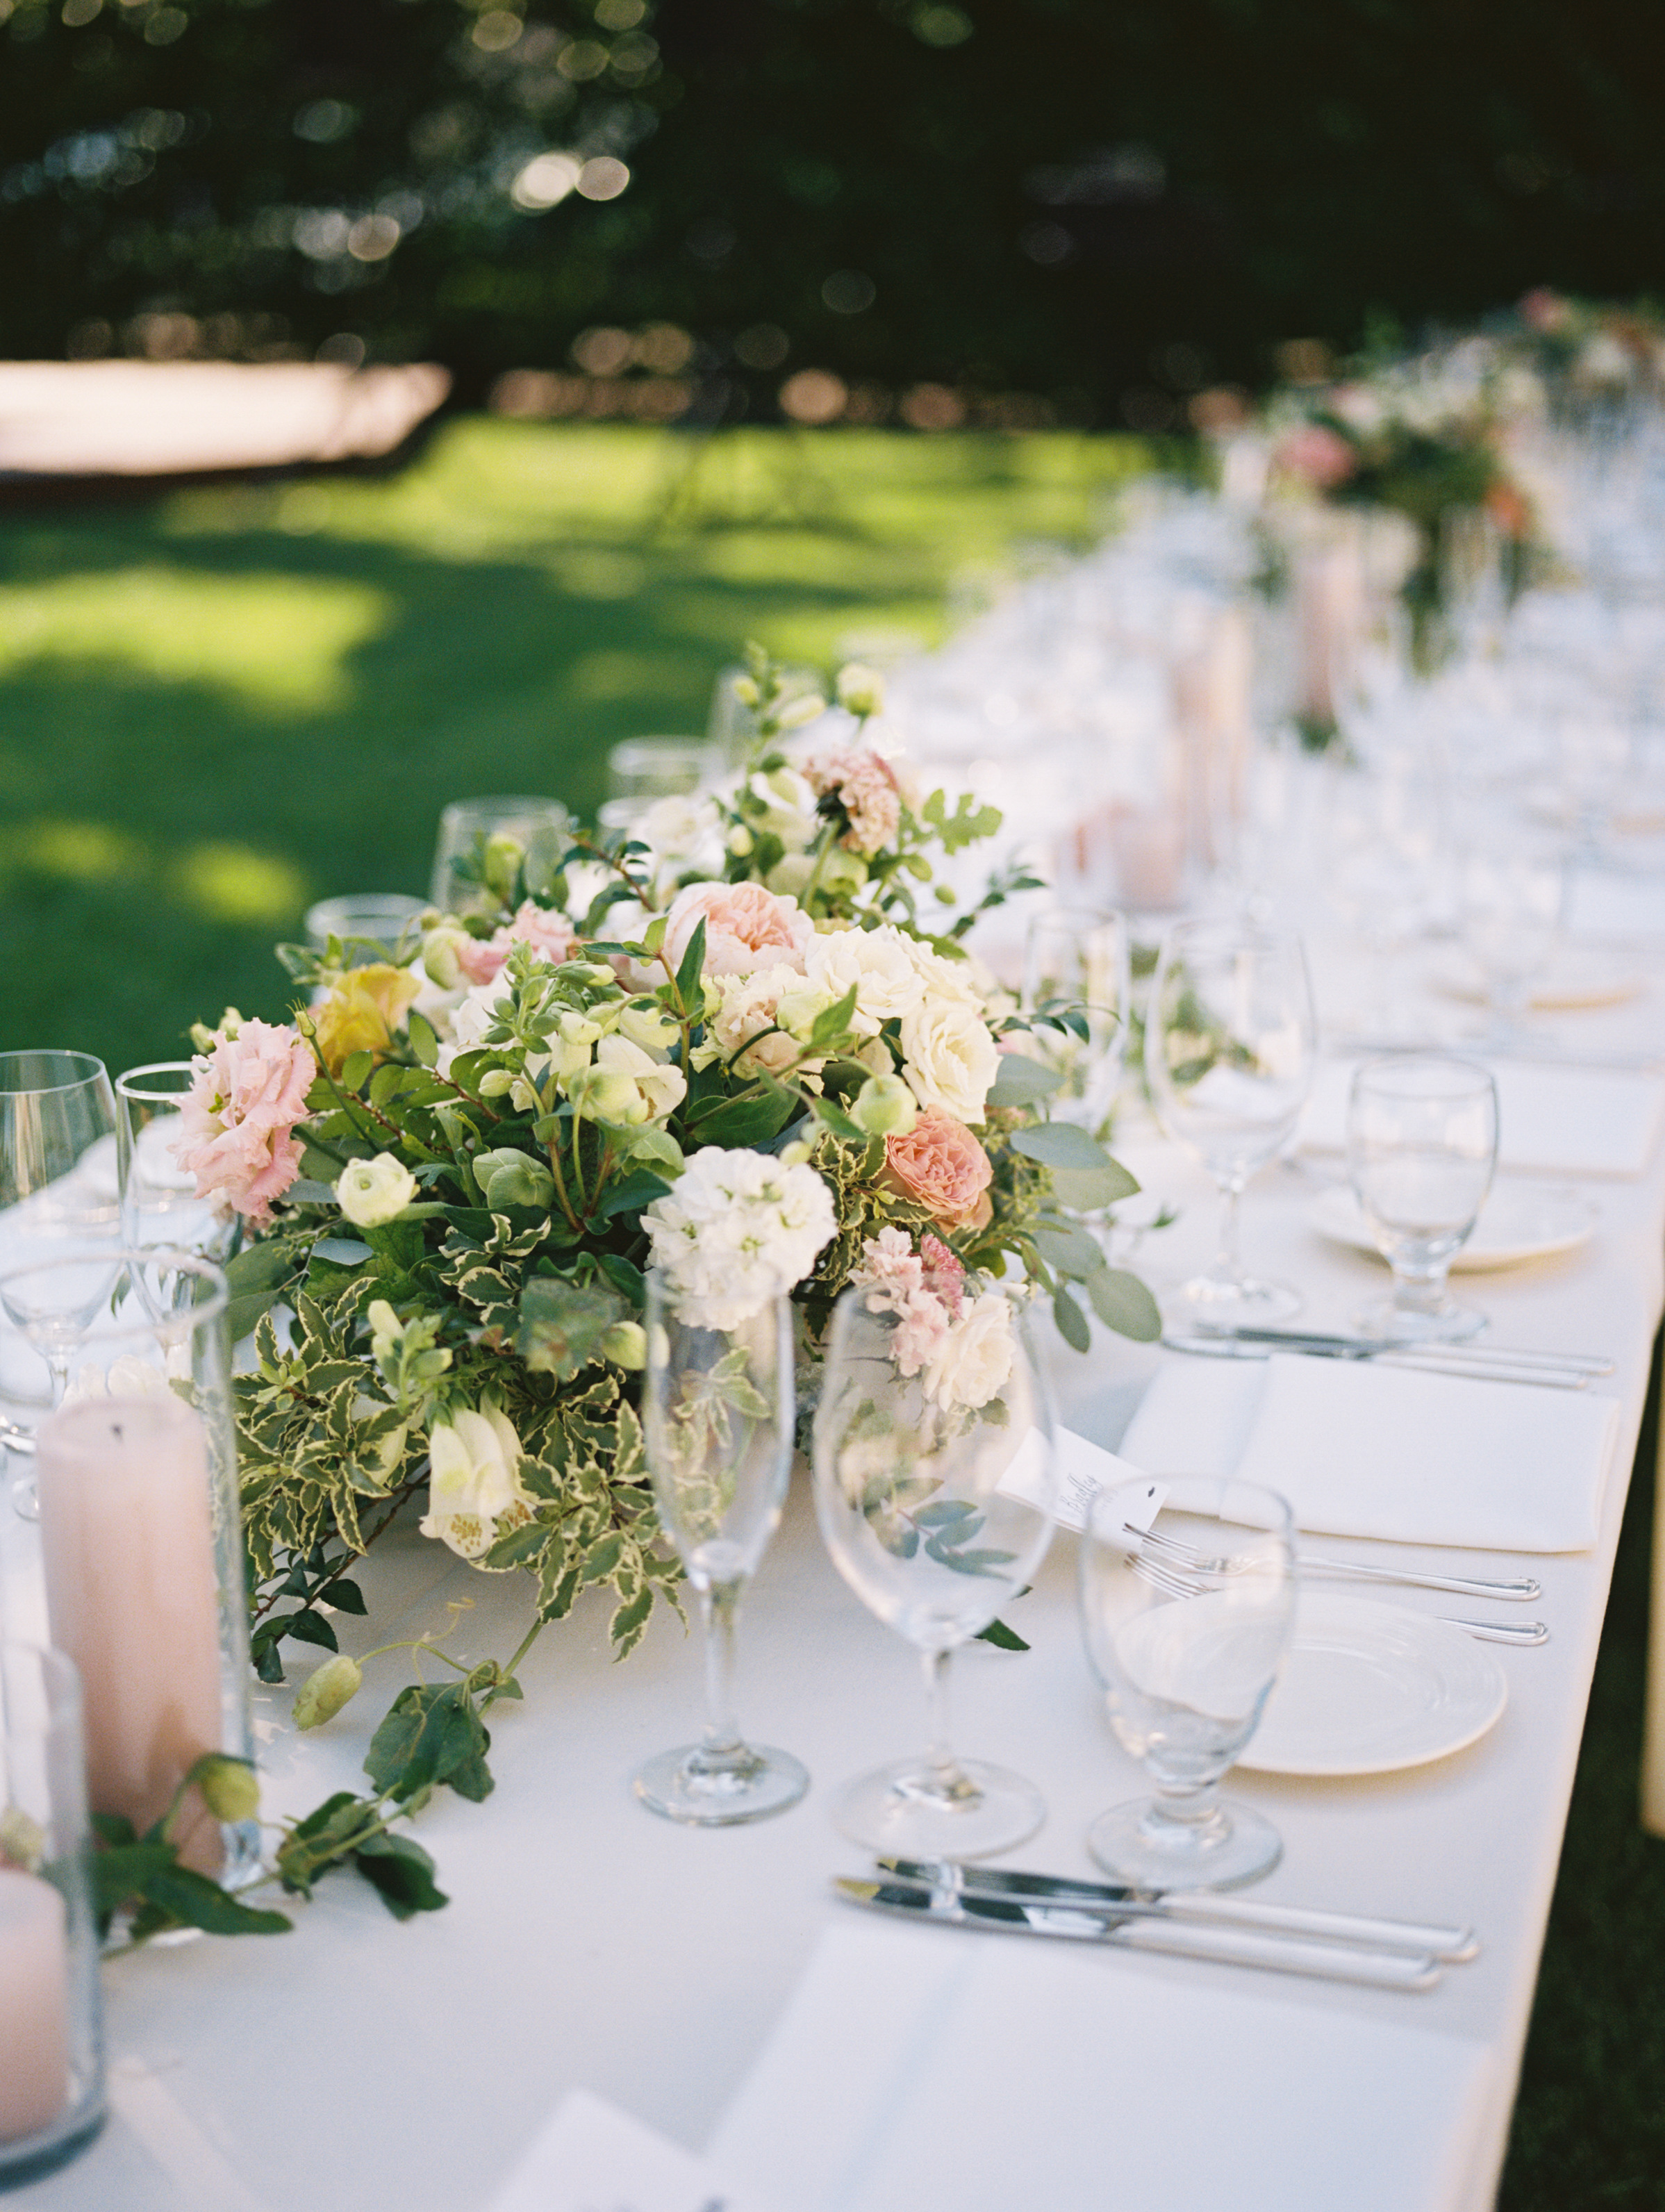 www.santabarbarawedding.com | Ryanne Bee Photography | The Santa Barbara Club | Reception Tables Set-Up